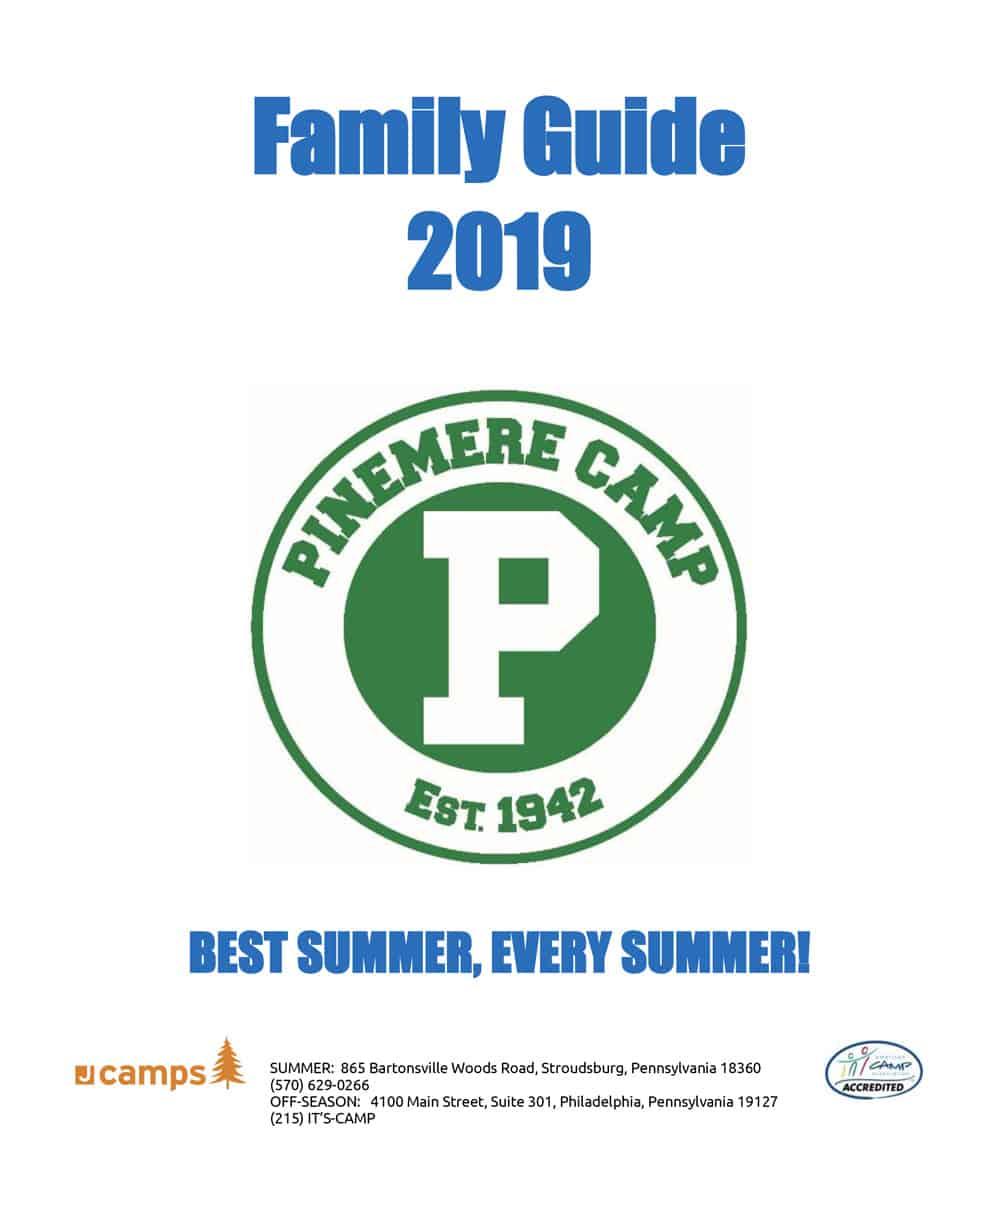 2019 Family Guide